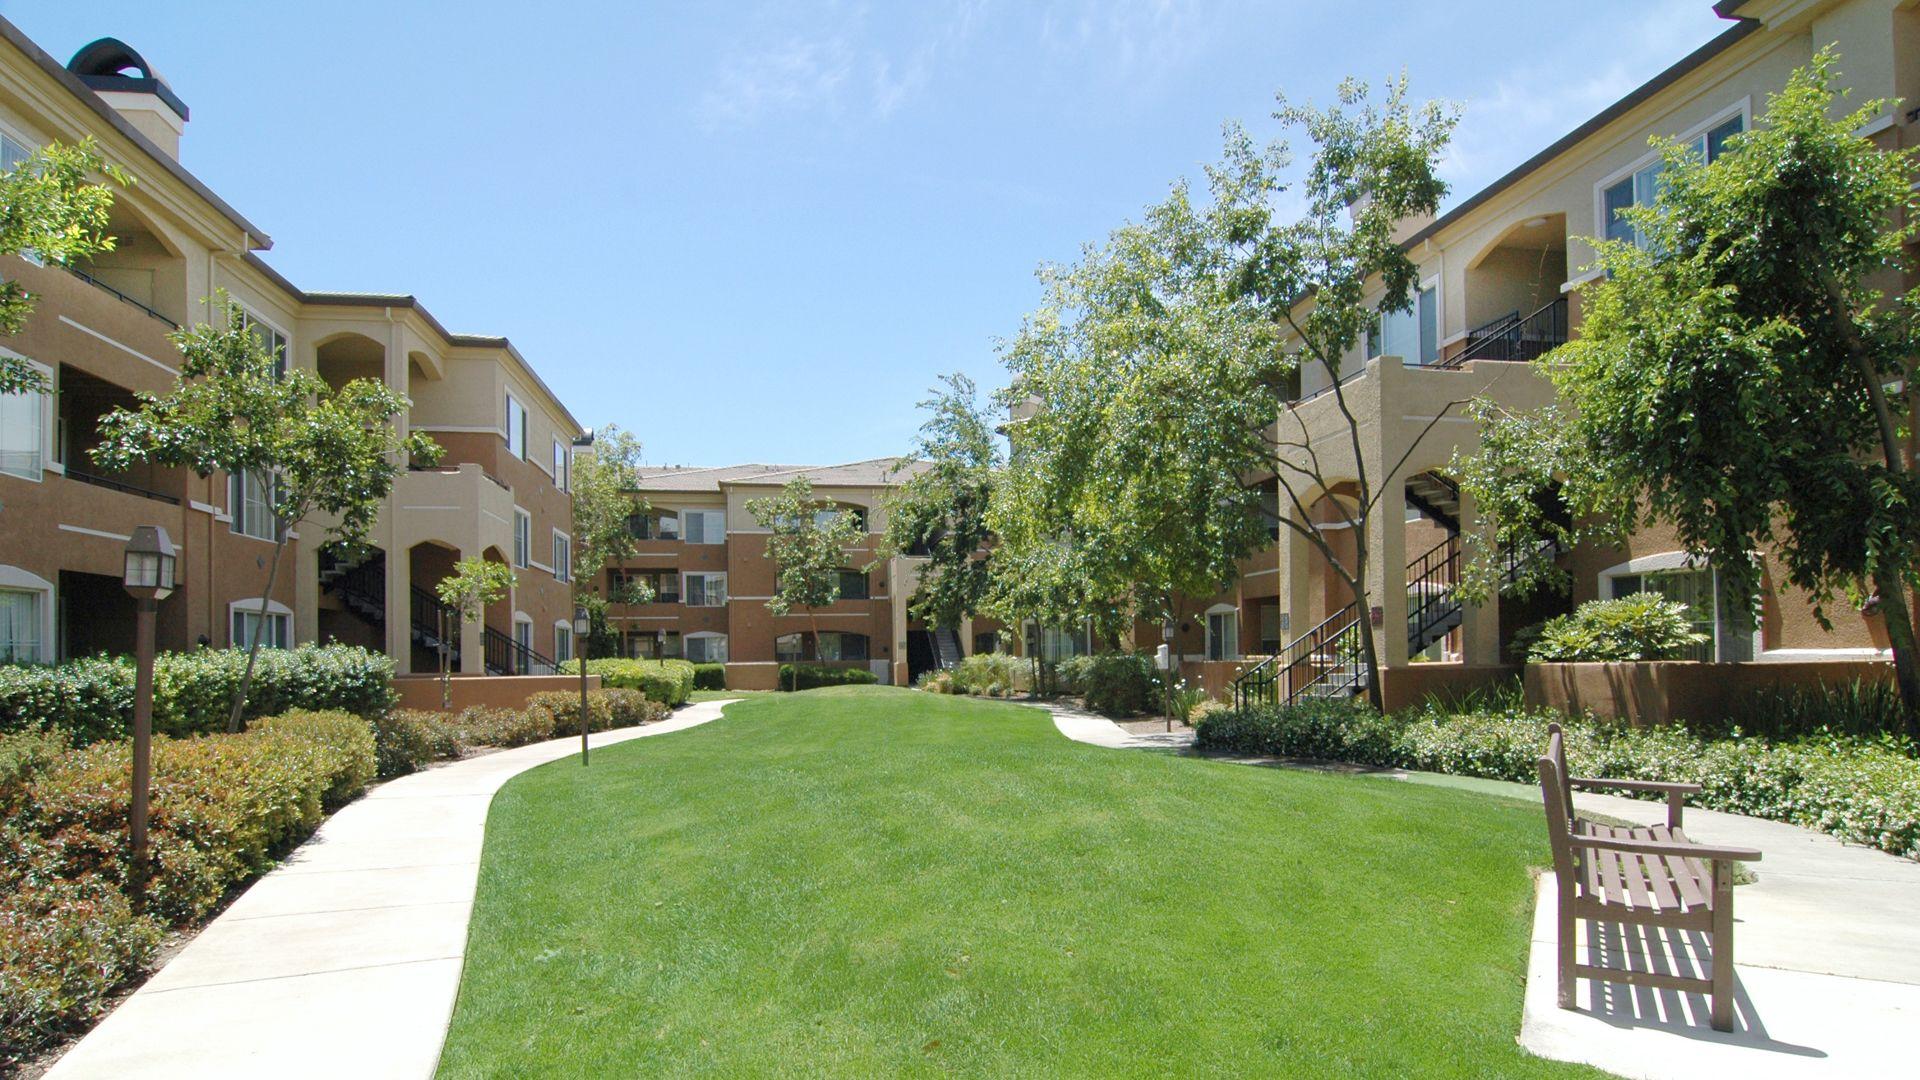 Alborada Apartments - Courtyard